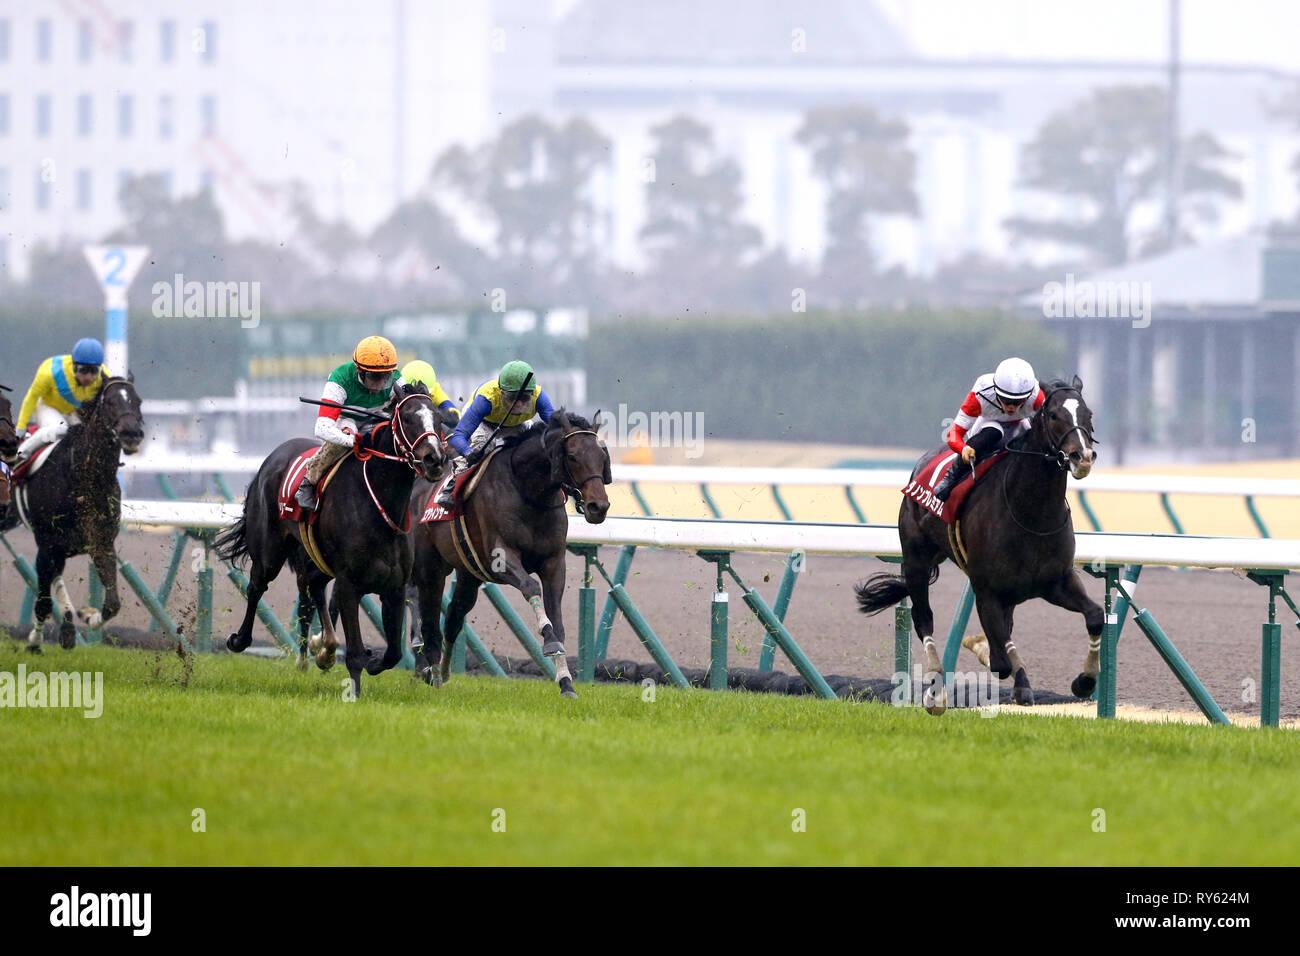 Aichi, Japan. 10th Mar, 2019. (R-L) Danon Premium (Yuga Kawada), Air Windsor (Yutaka Take), Lys Gracieux ( Andrasch Starke), Tanino Frankel (Hayato Yoshida) Horse Racing : Danon Premium ridden by Yuga Kawada wins the Kinko Sho at Chukyo Racecourse in Aichi, Japan . Credit: Eiichi Yamane/AFLO/Alamy Live News Stock Photo